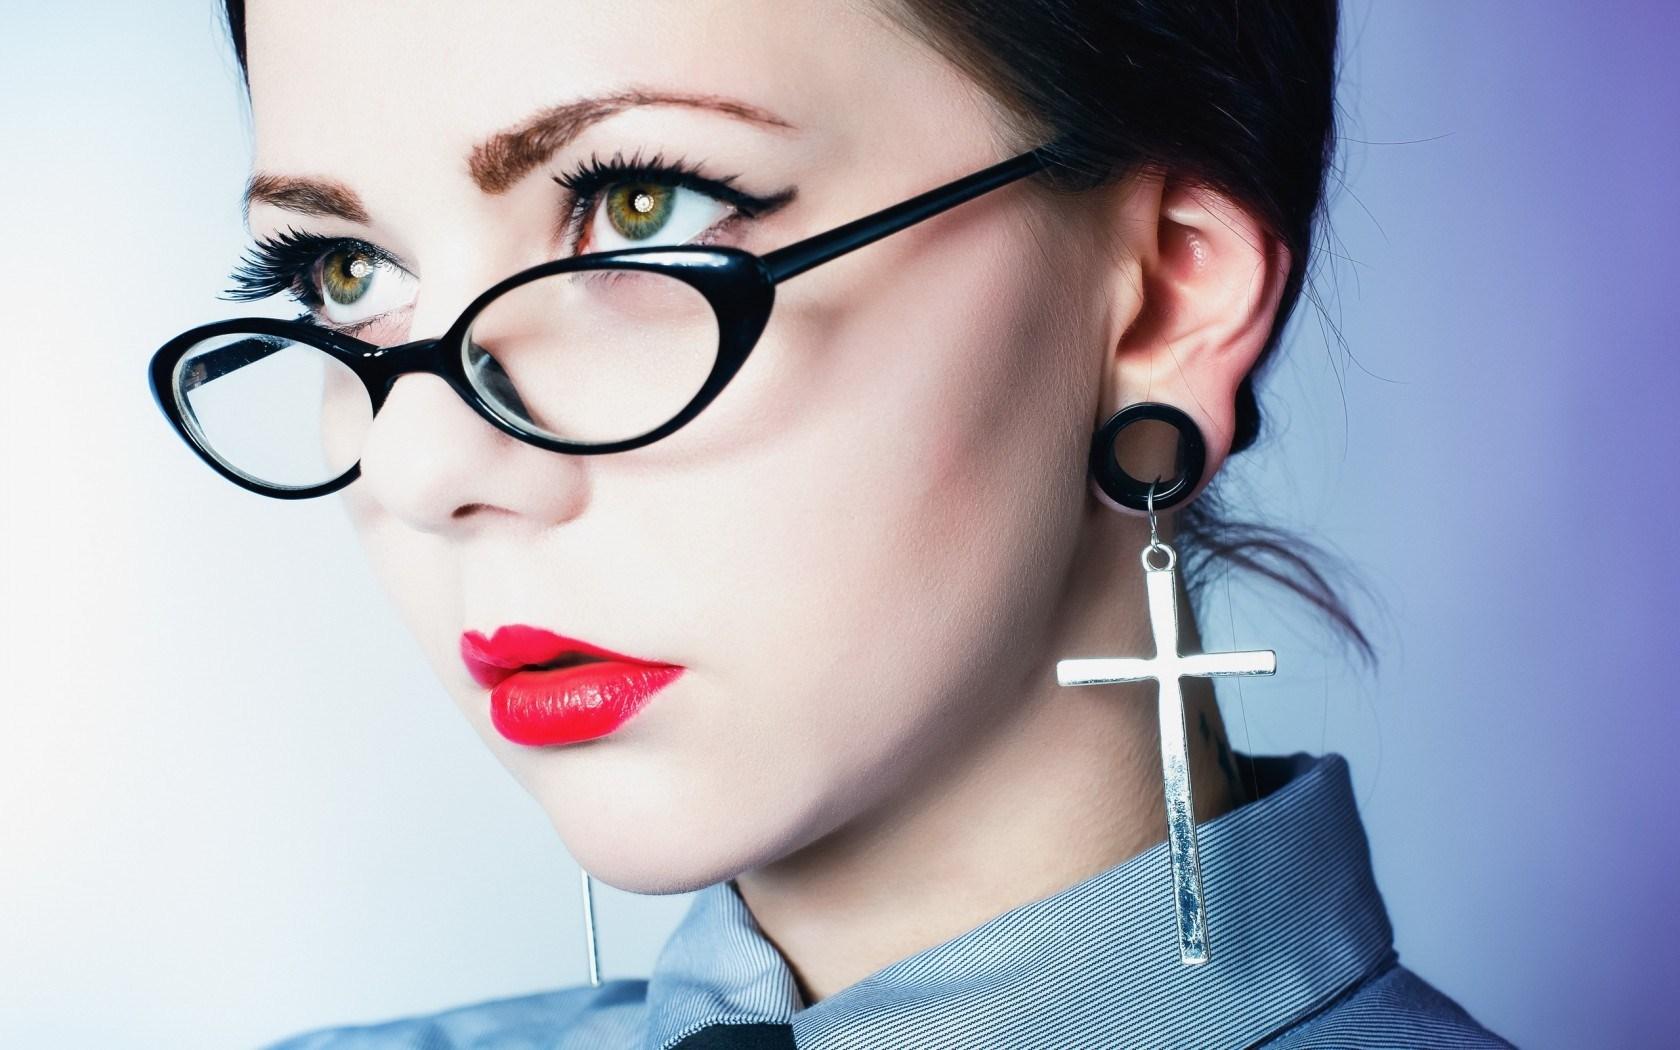 Free Girl Glasses Wallpaper 42778 1920x1200 px